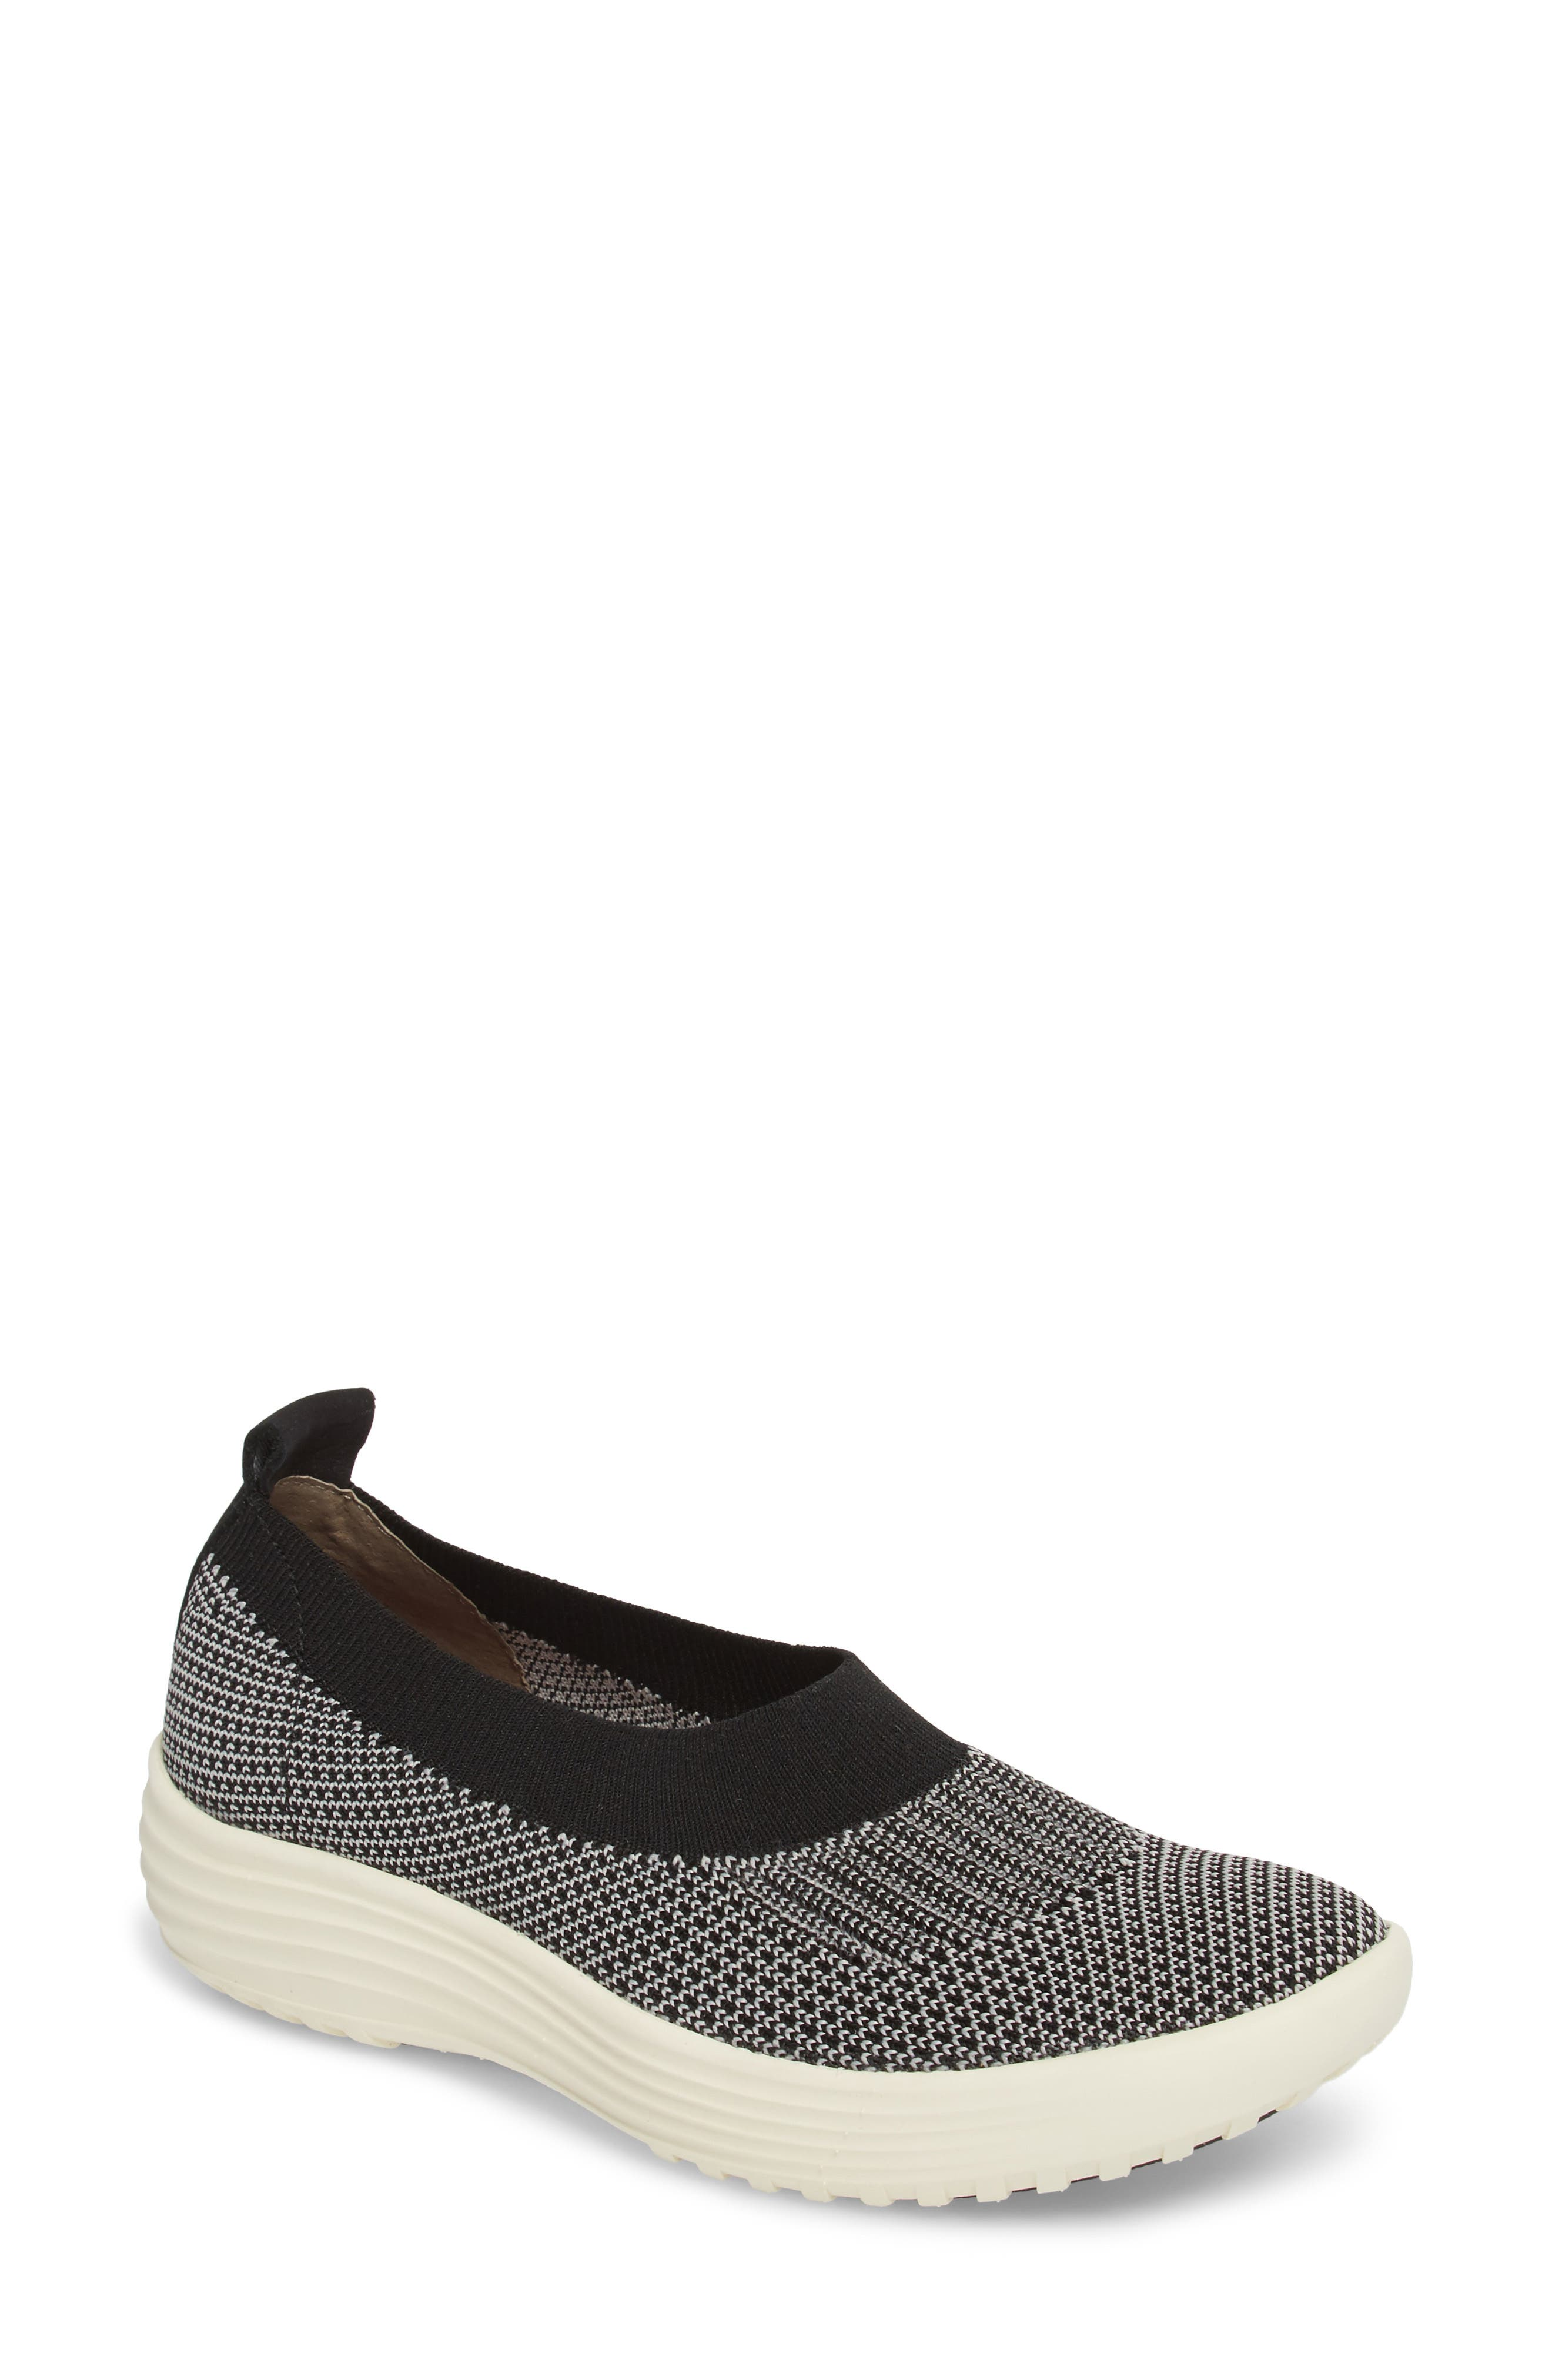 Merigold Slip-On Sock Fit Sneaker, Main, color, BLACK/ MIST GREY FABRIC